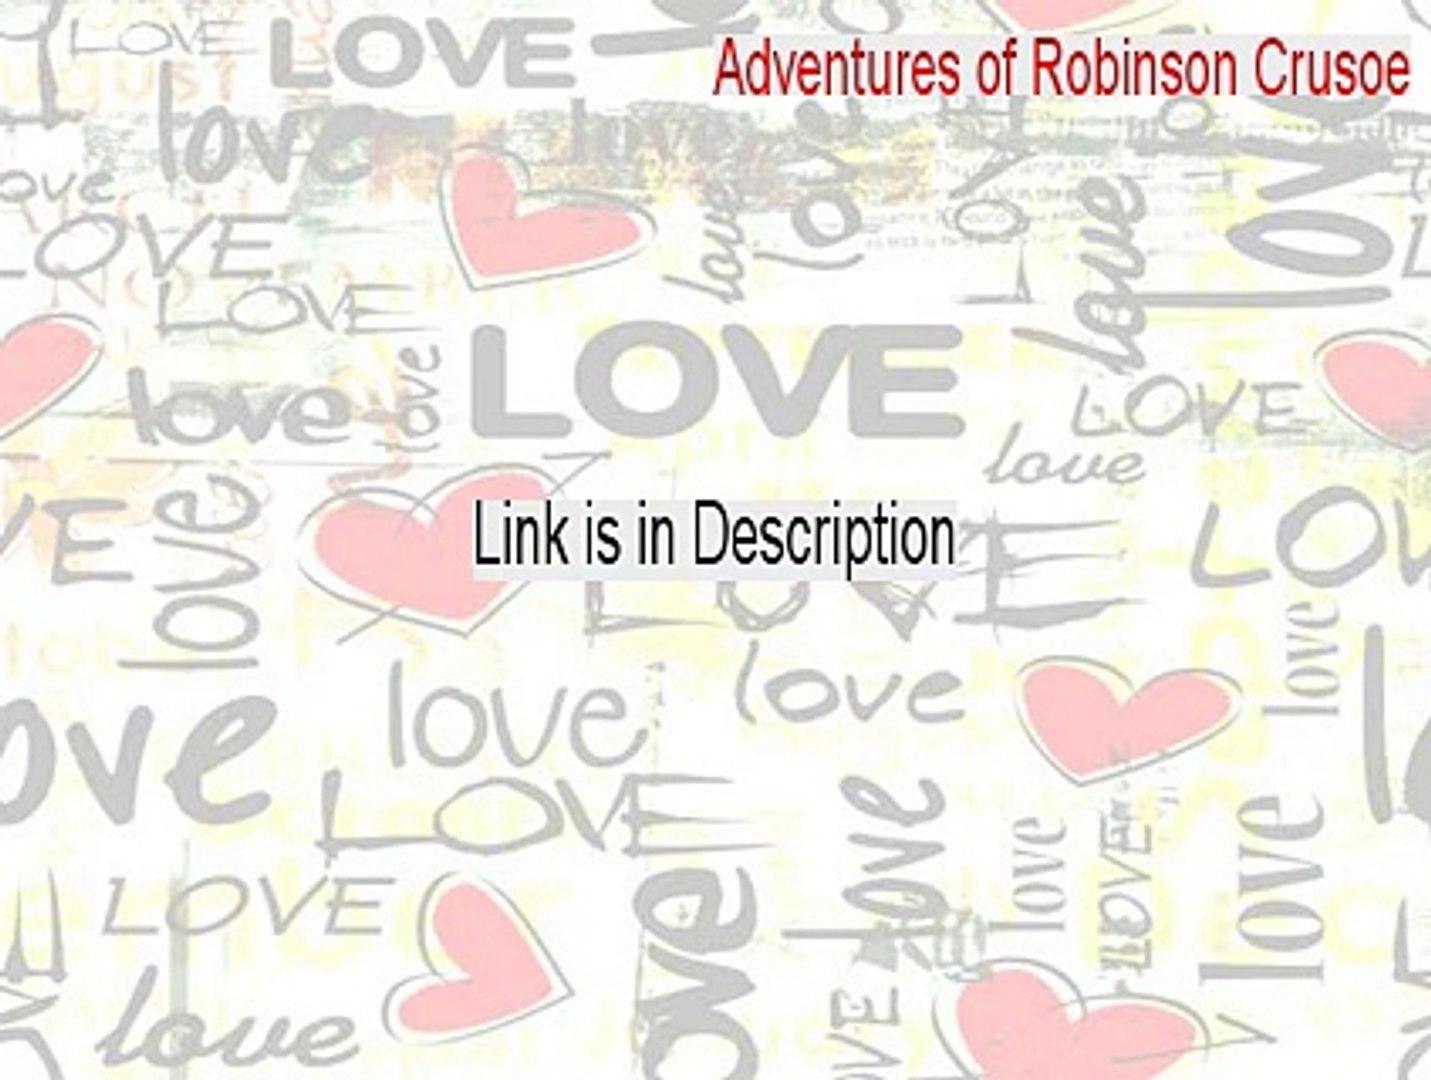 Adventures of Robinson Crusoe Keygen - Adventures of Robinson Crusoeadventures of robinson crusoe (2